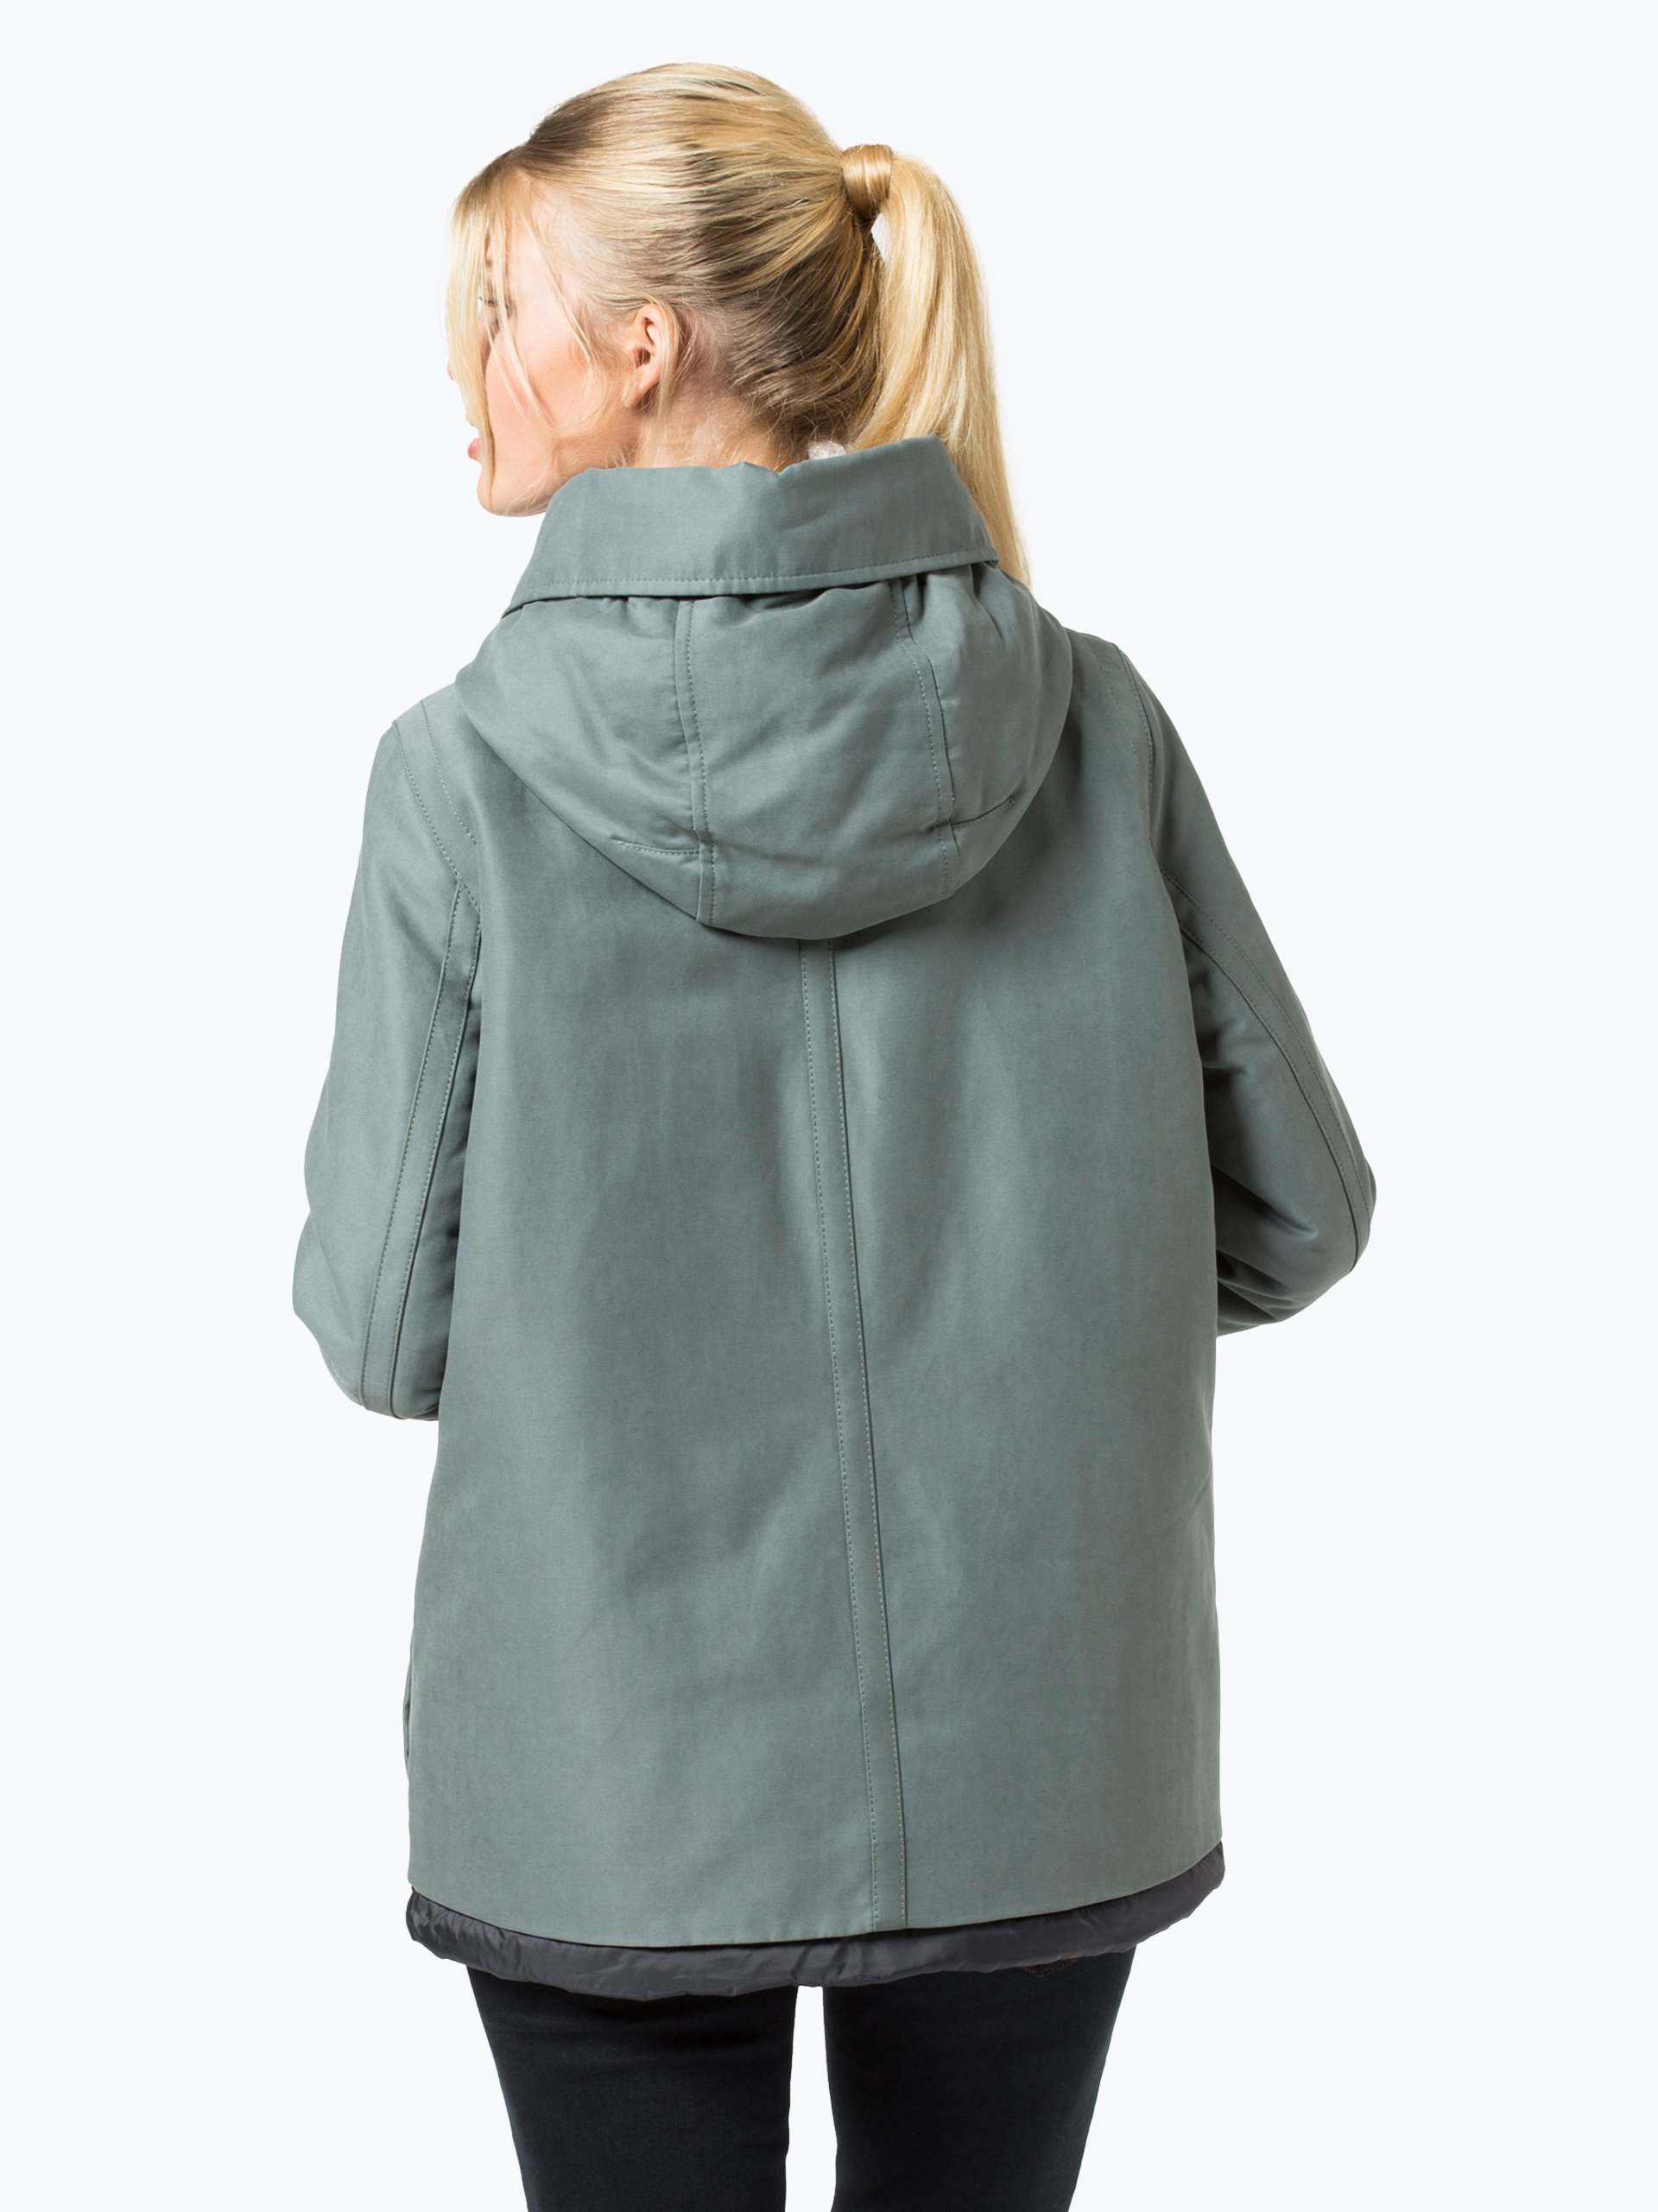 Marc O'Polo Damen Jacke online kaufen | PEEK-UND